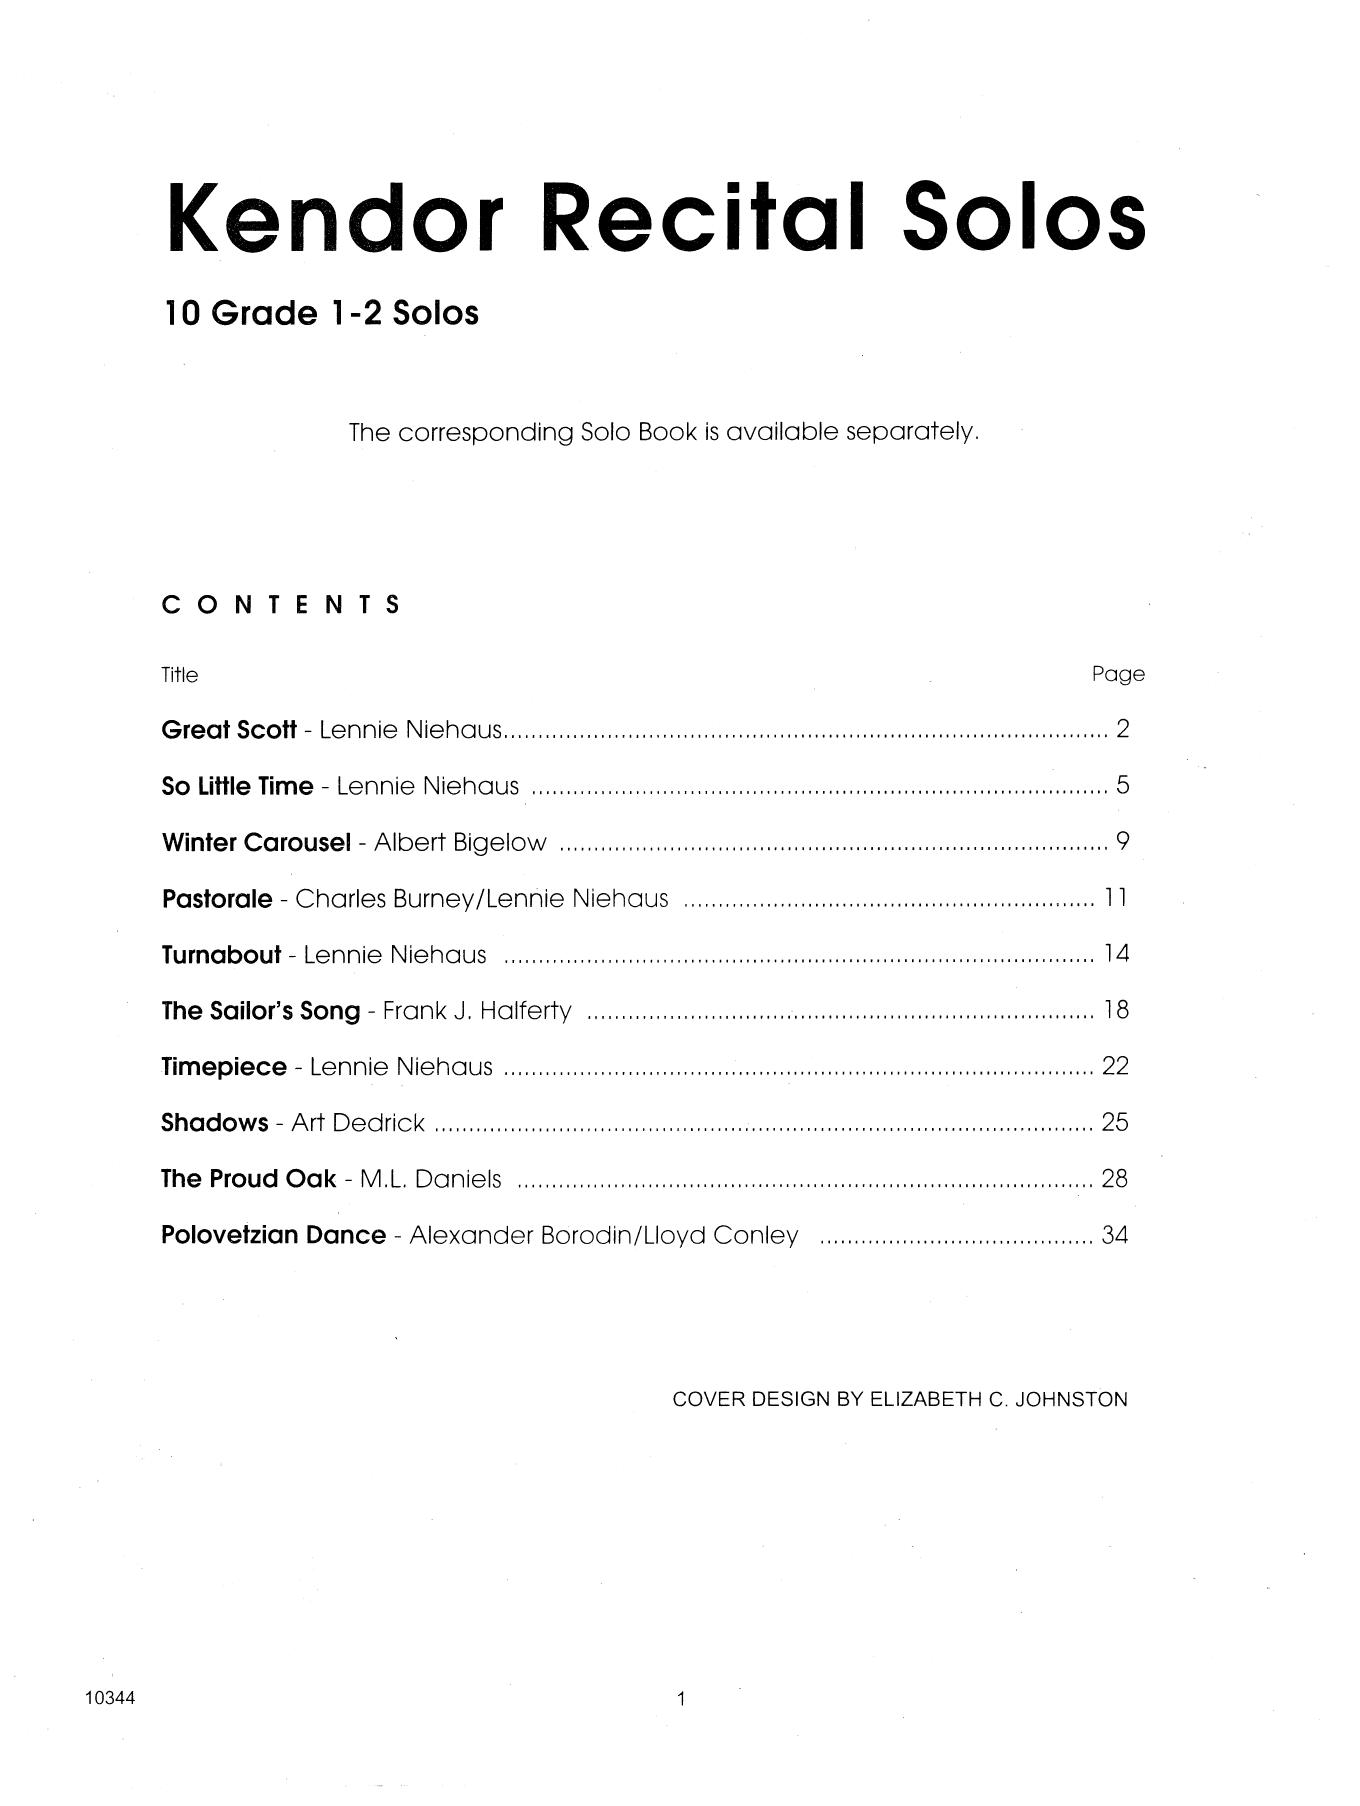 Kendor Recital Solos - Trombone - Piano Accompaniment Sheet Music